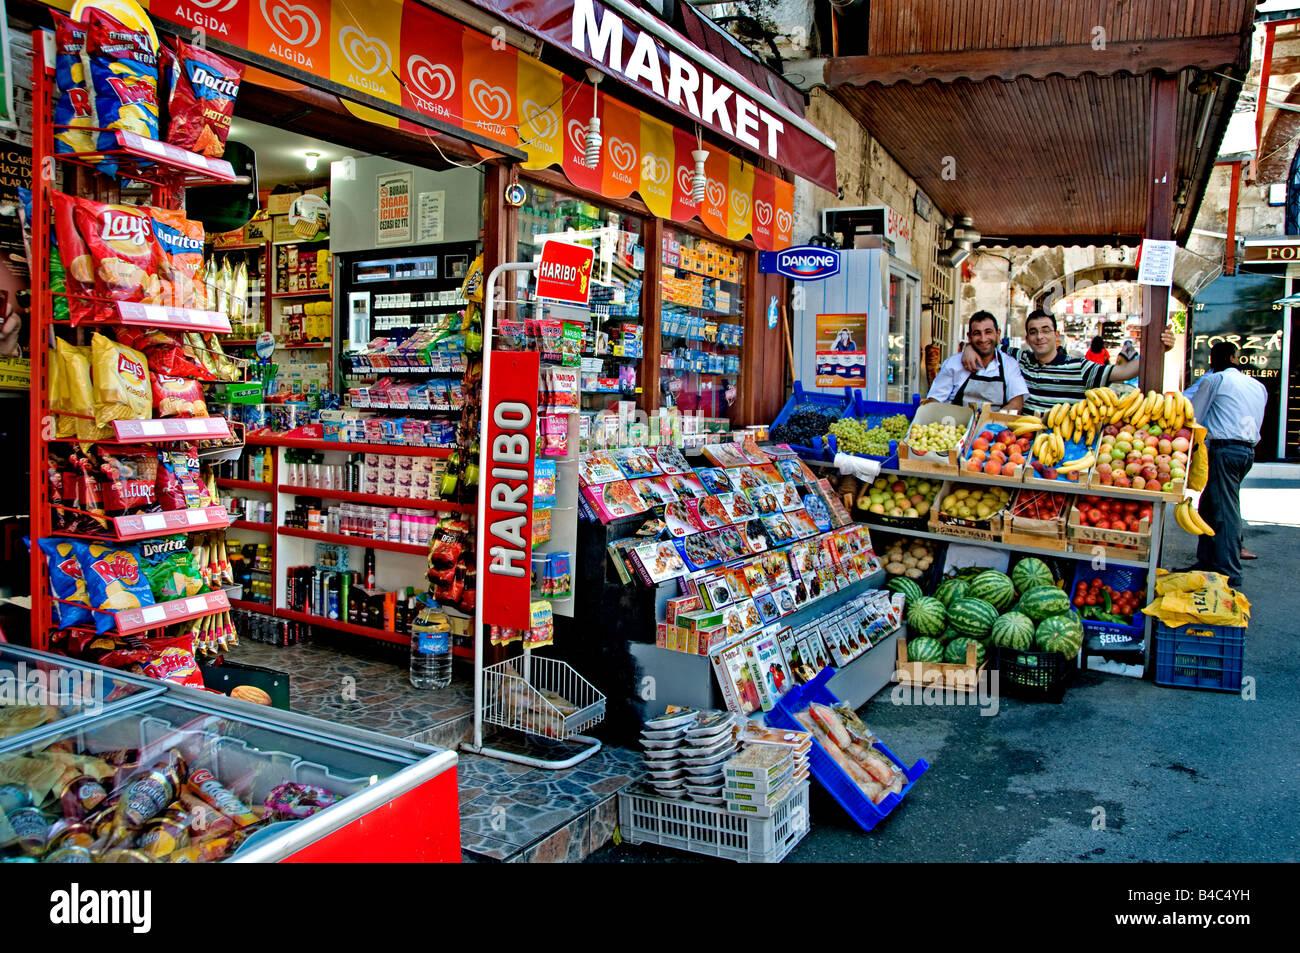 Grand Bazaar Kapali Carsi Kapalıcarsı Istanbul Turkey Stock Photo